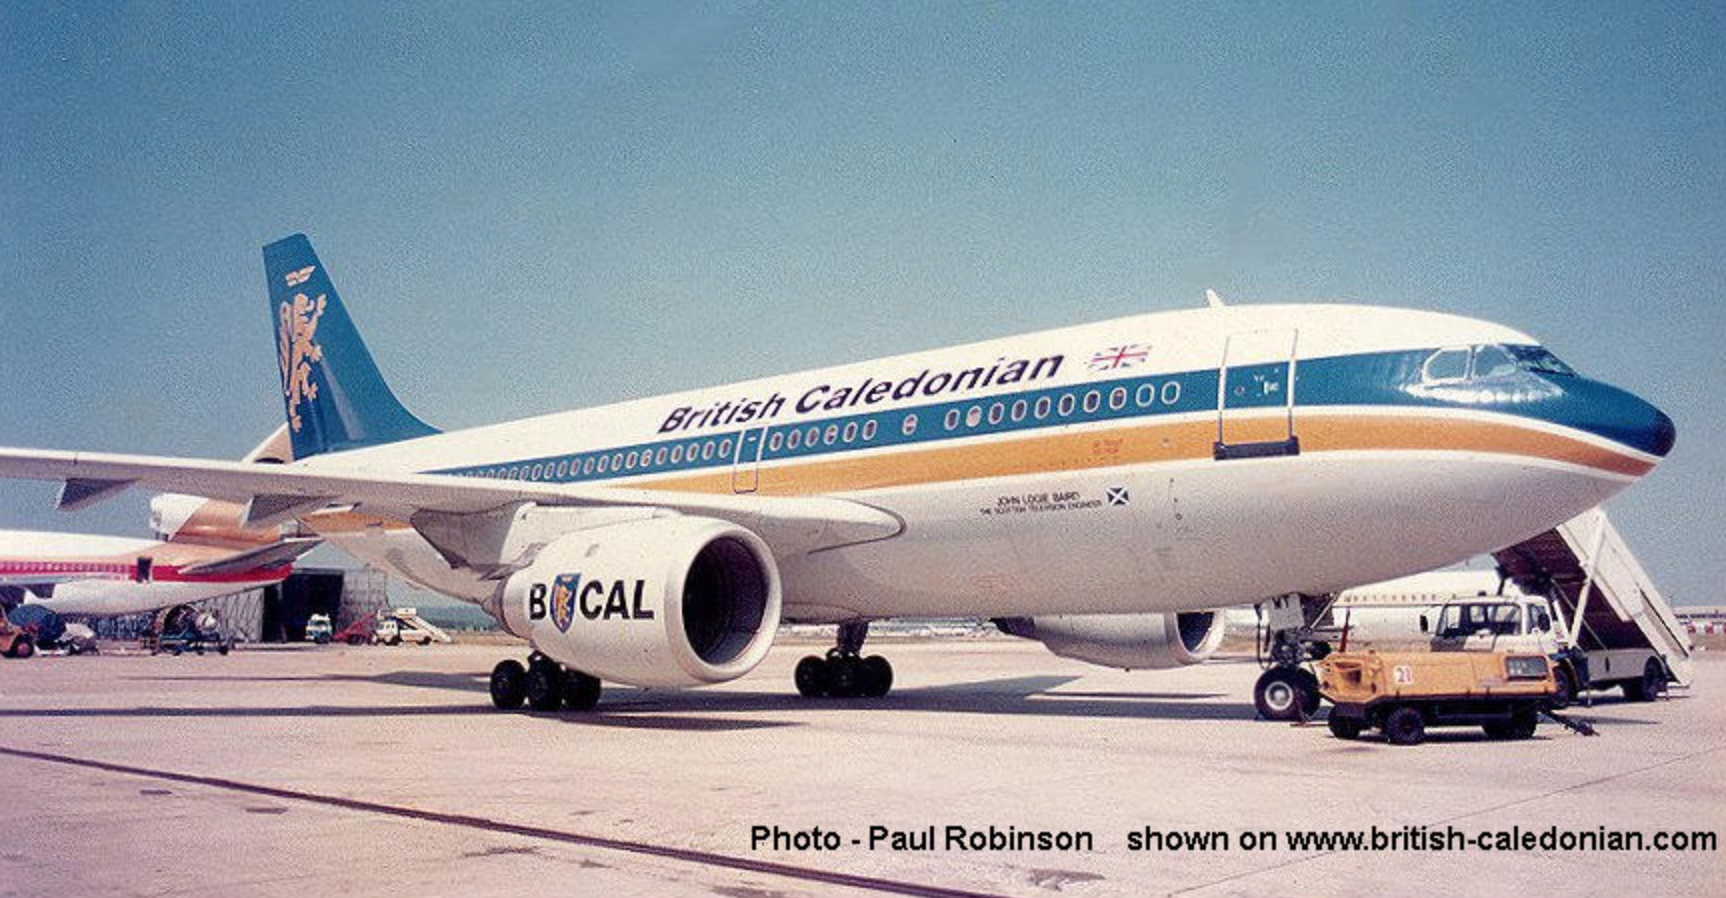 British Caledoniam Airways